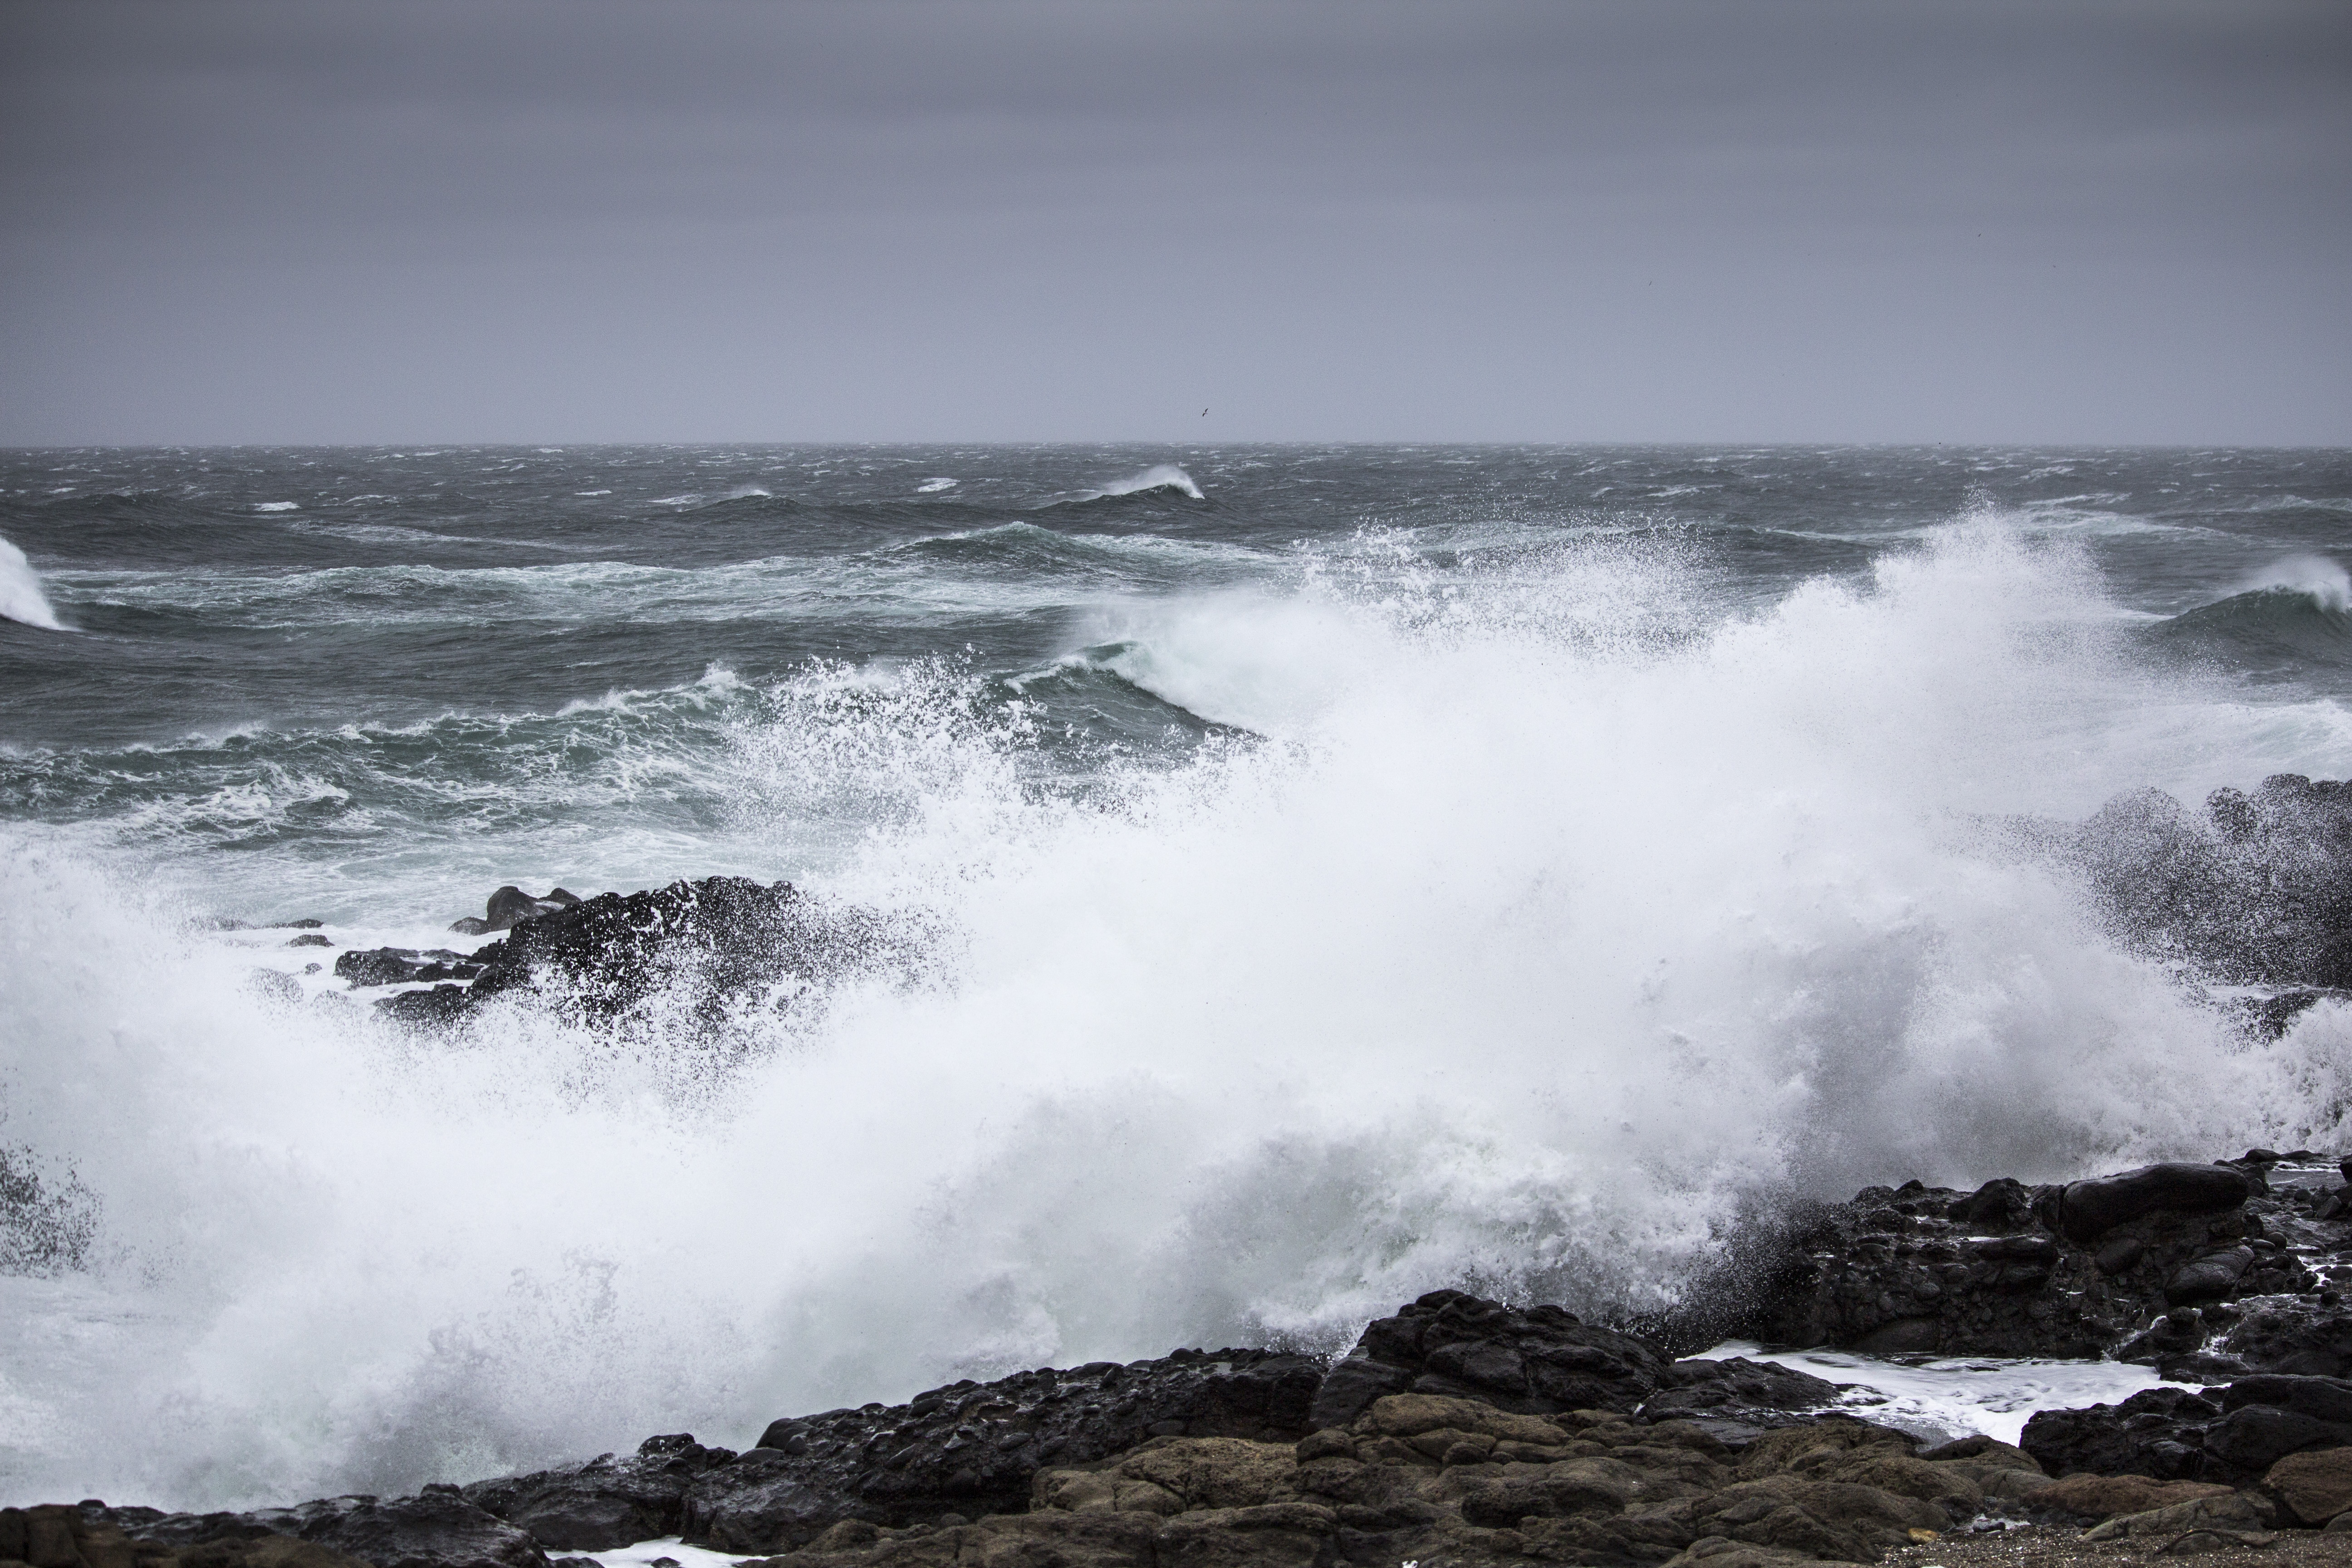 Breaking waves winter storm, Oregon Coast, Breaking, Clouds, Coast, Landscape, HQ Photo